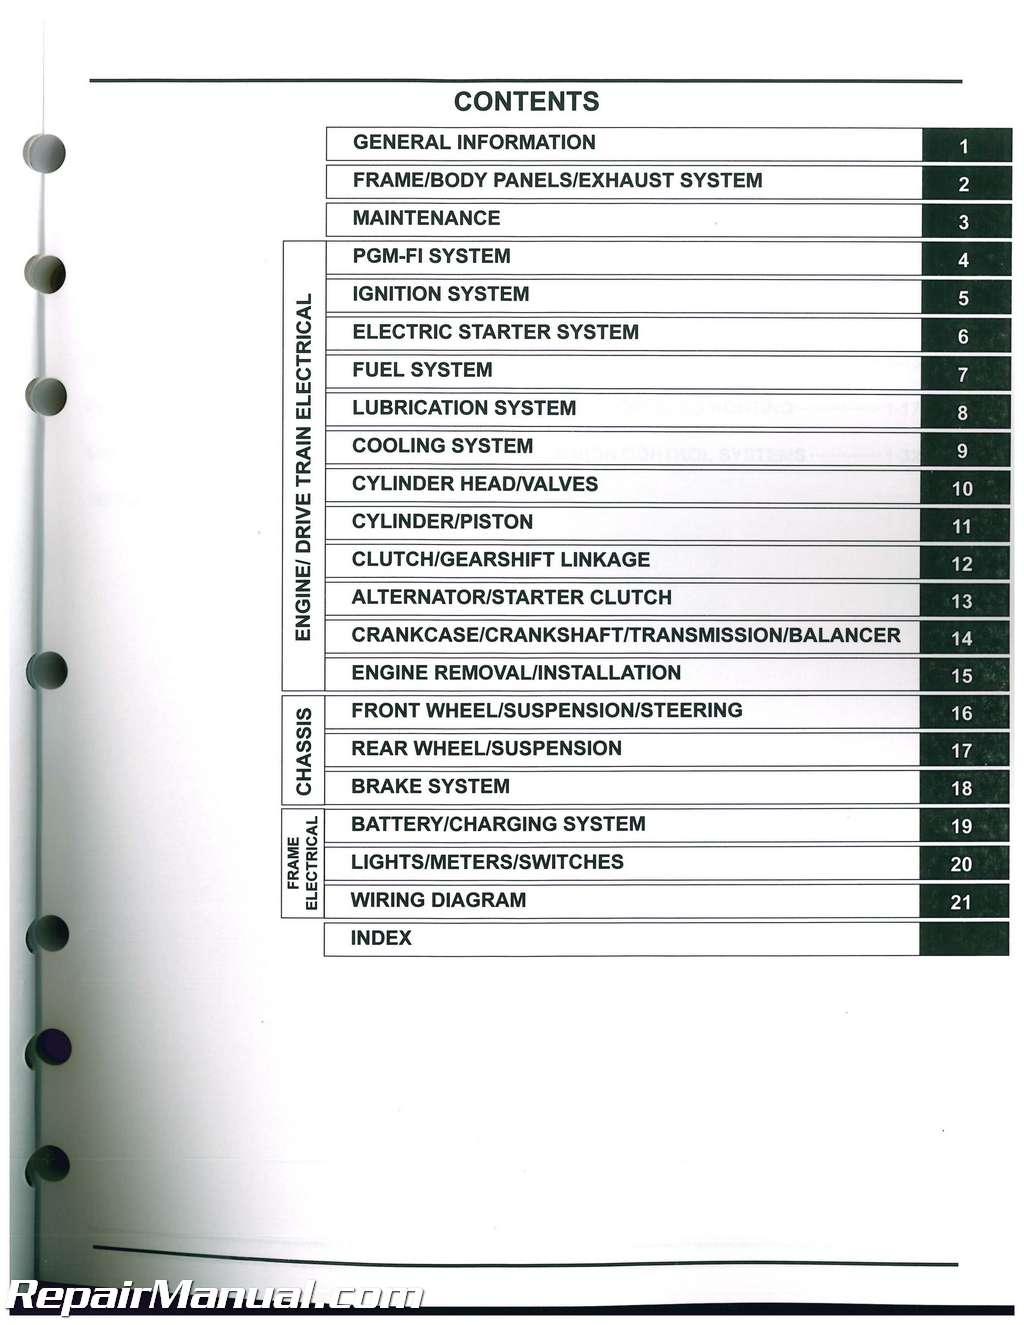 2013 honda cbr250r service manual